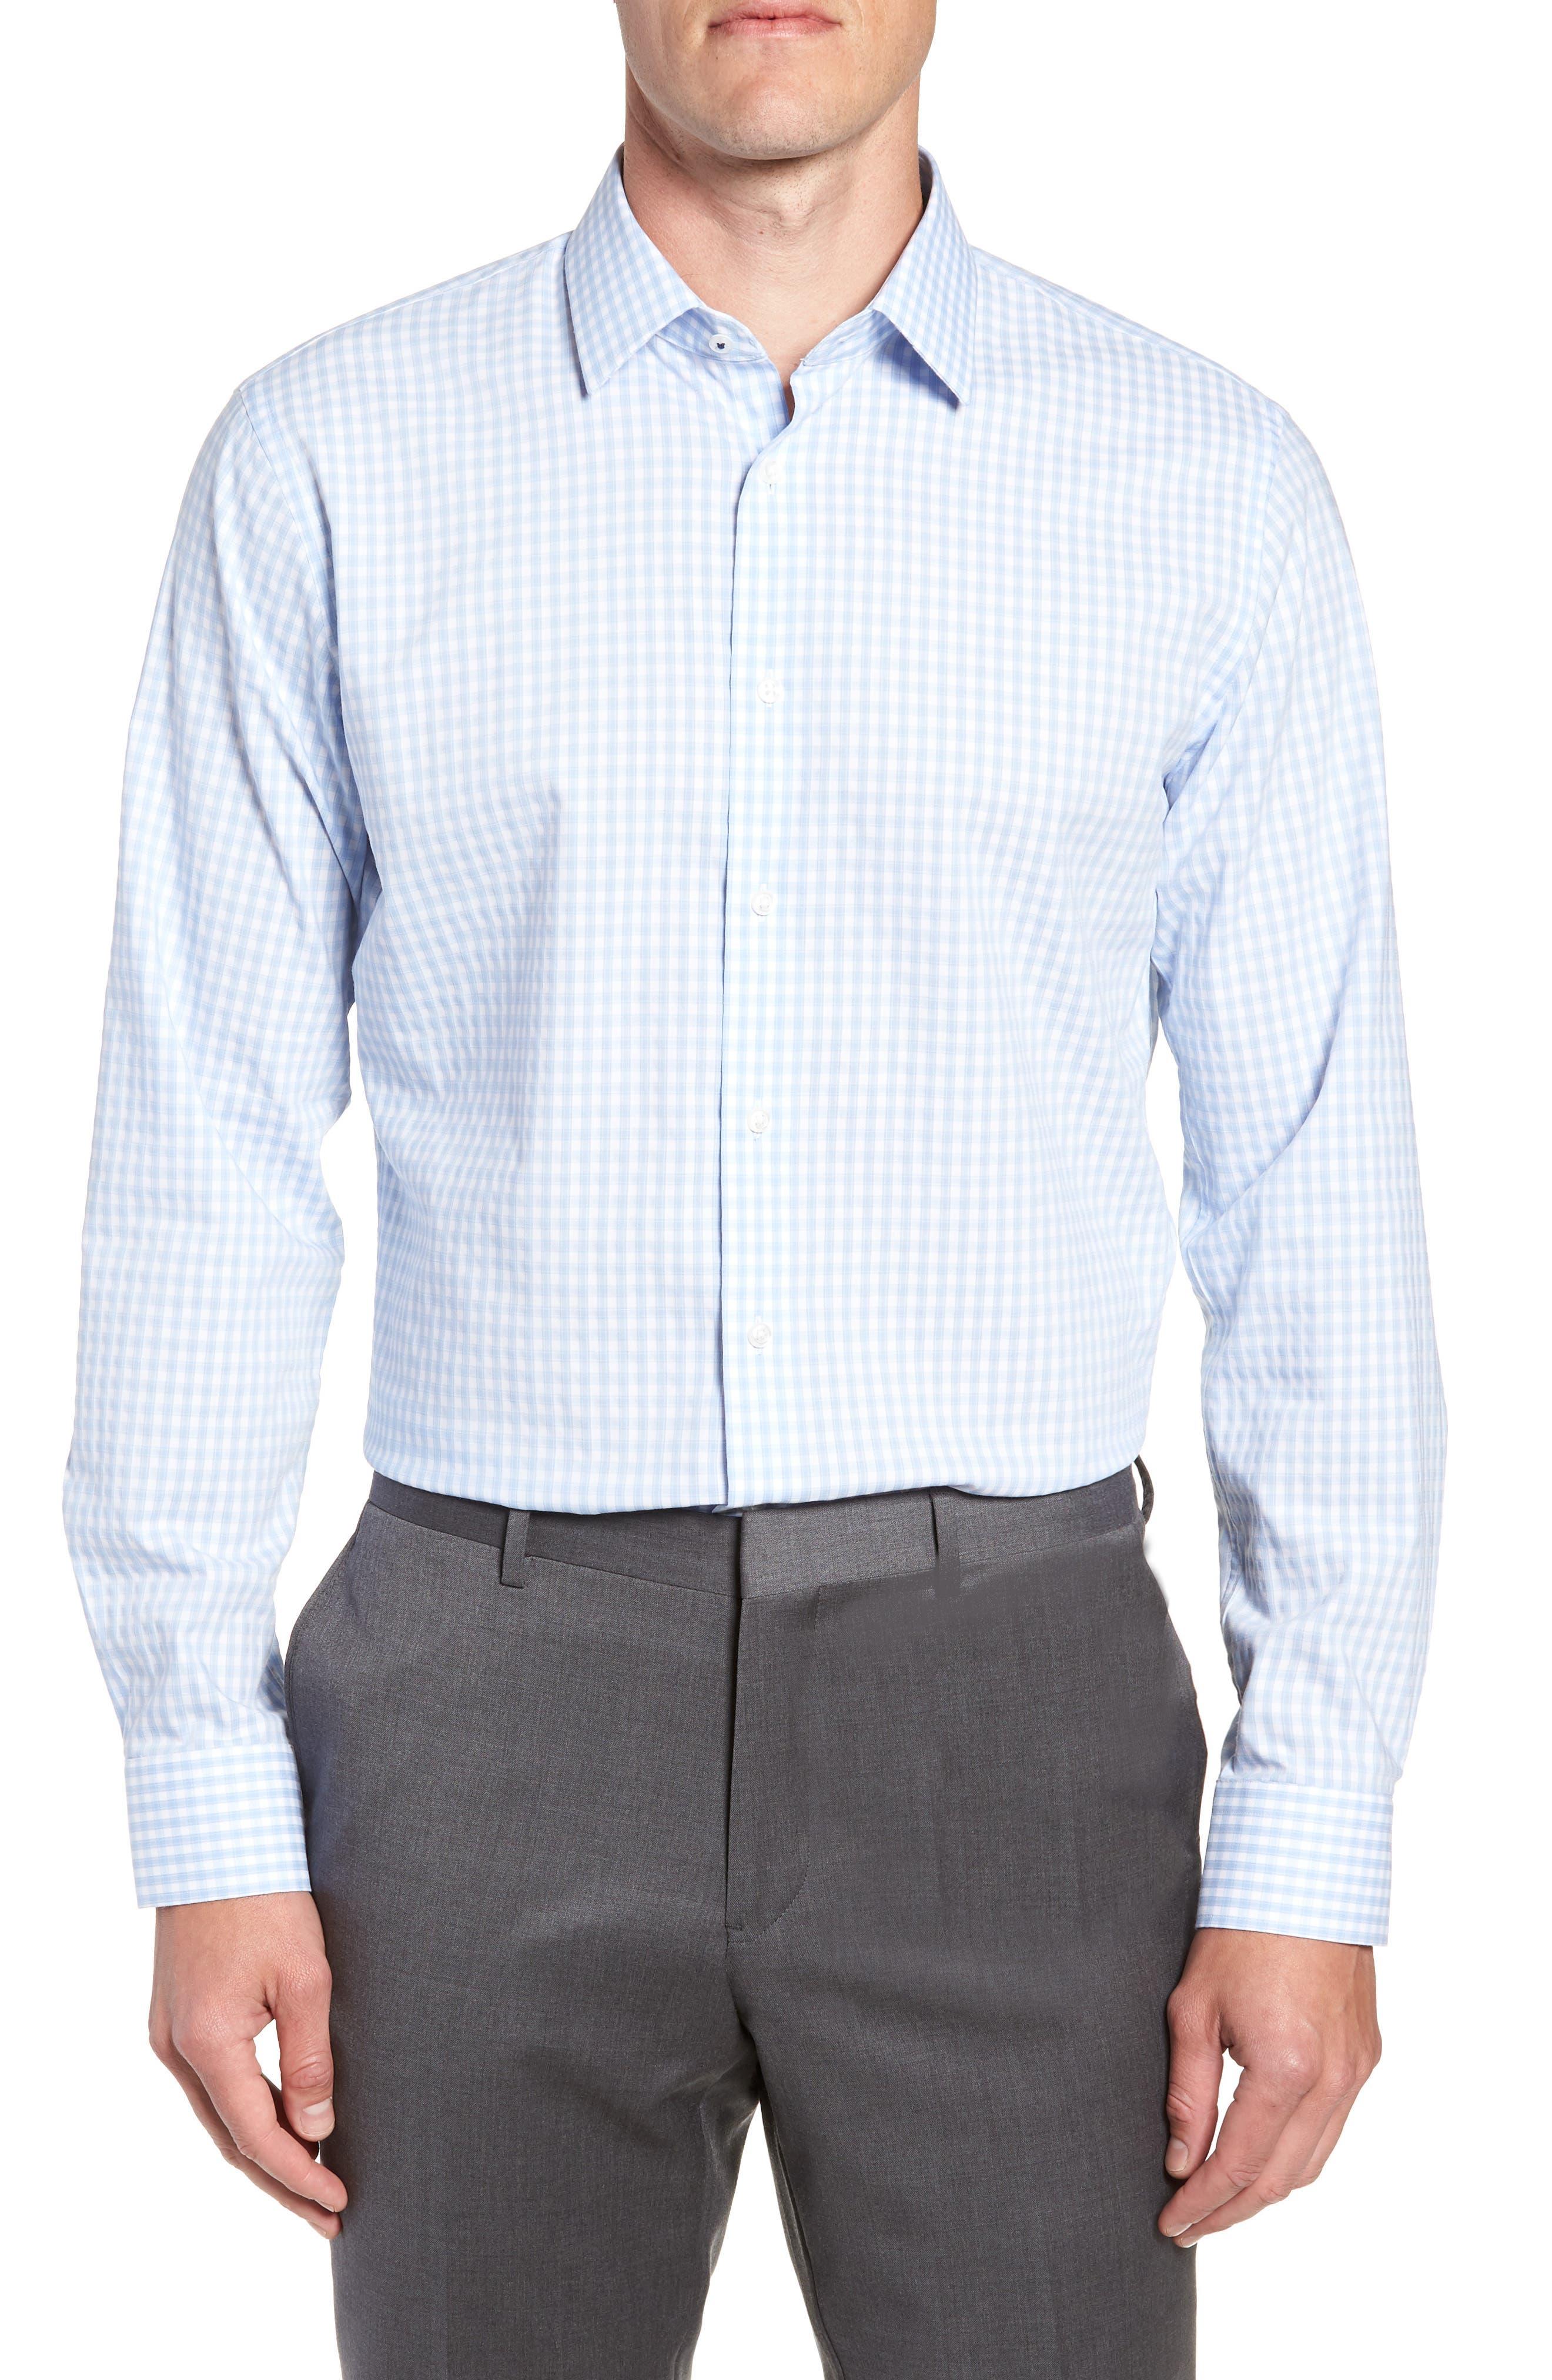 Tech-Smart Trim Fit Stretch Check Dress Shirt,                         Main,                         color, BLUE BRUNNERA